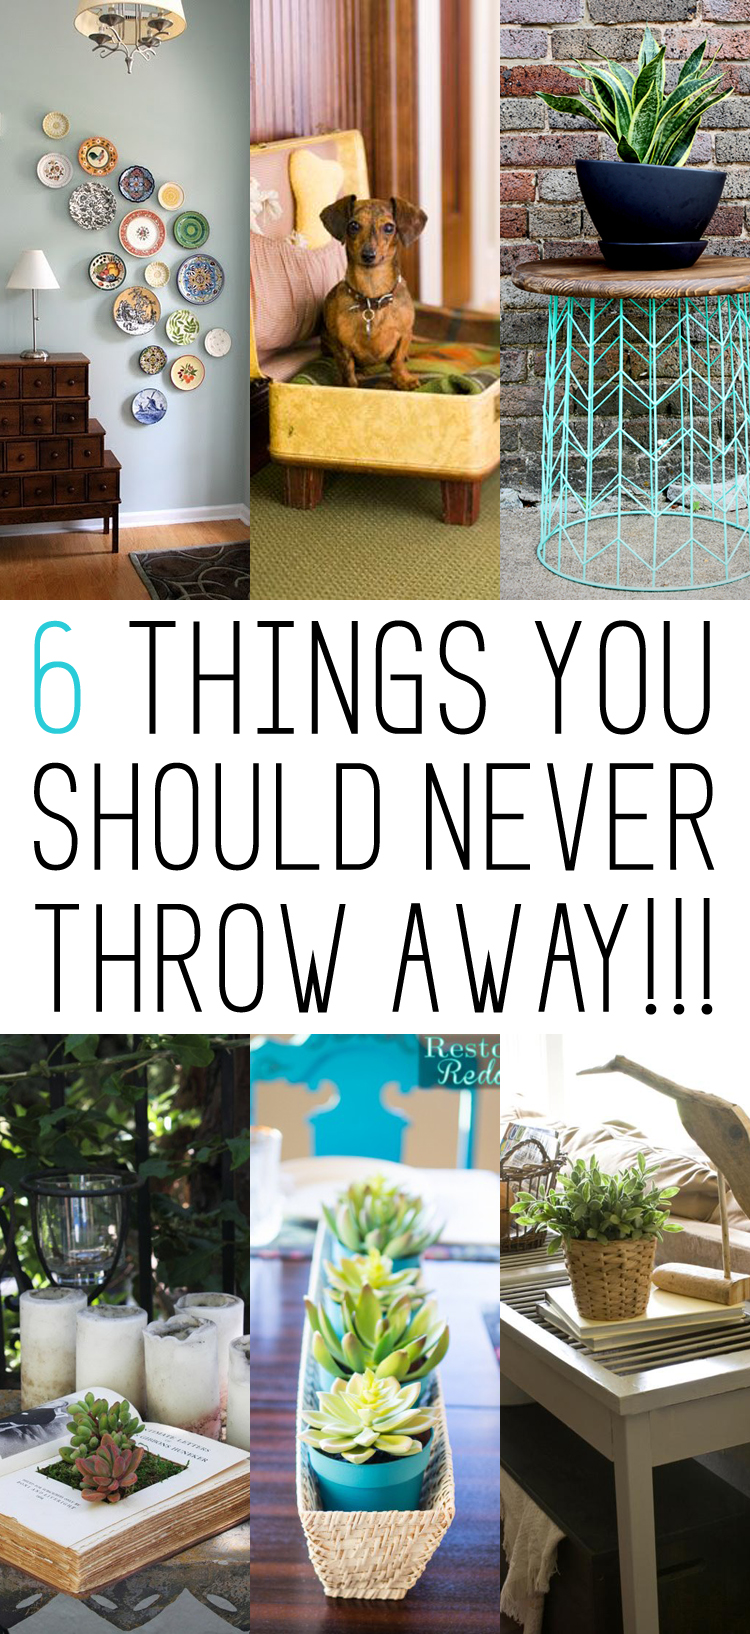 6 Things You Should NEVER THrow Away - Repurpose!